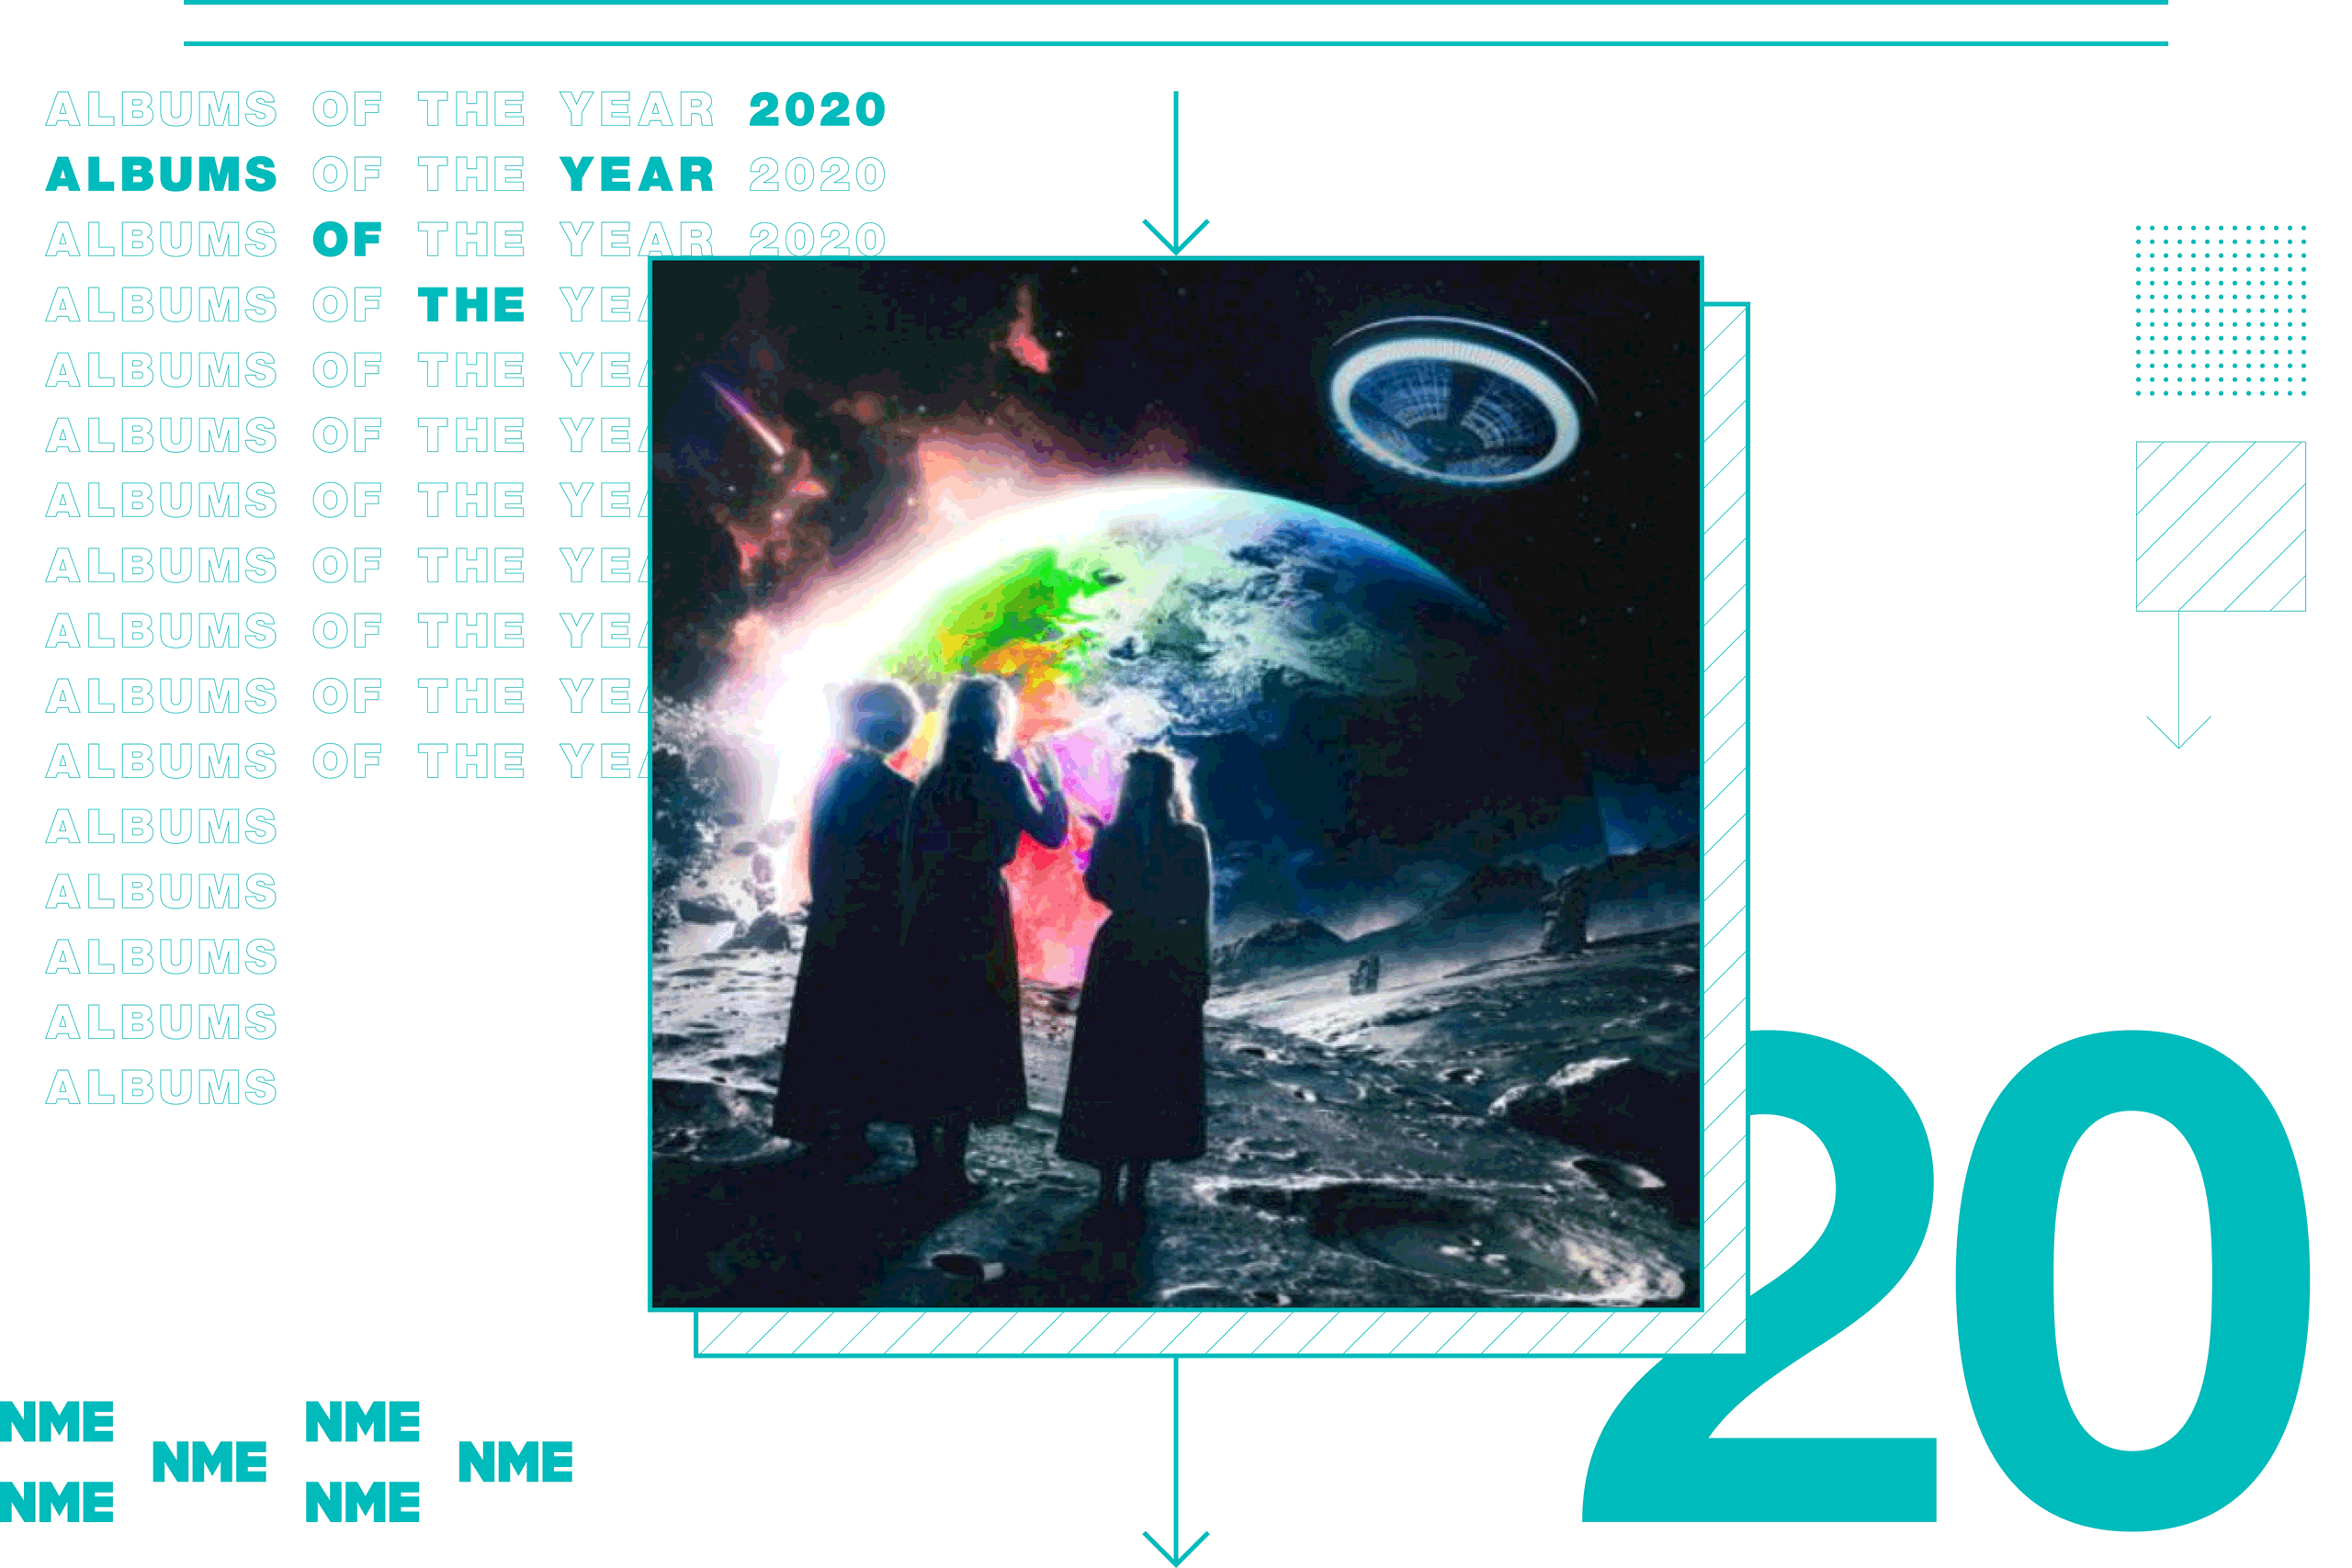 NME Album Of The Year 2020 Lil Uzi Vert, 'Eternal Atake'